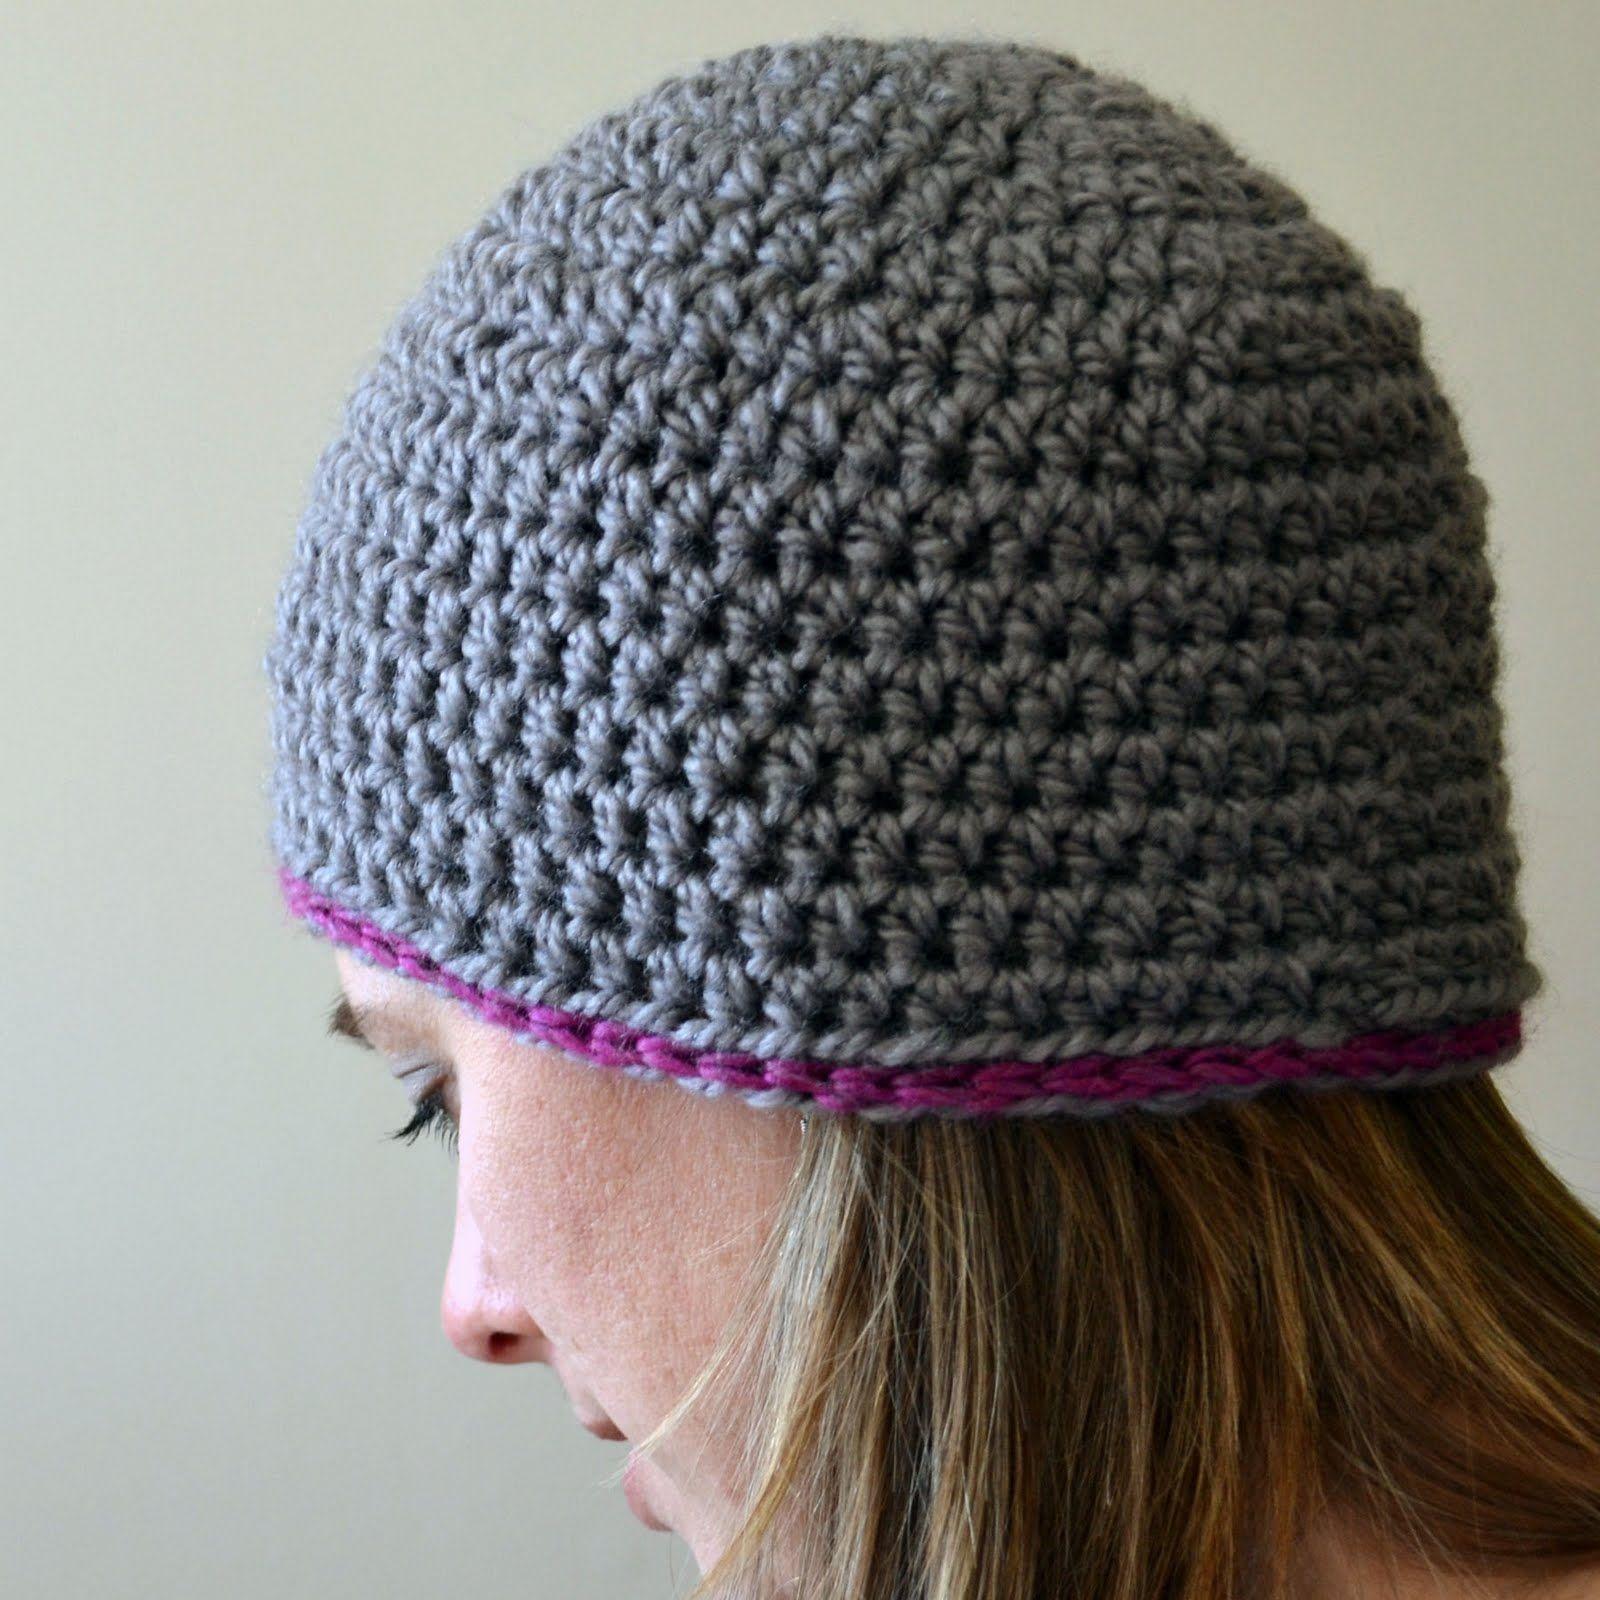 crochet love knot instructions